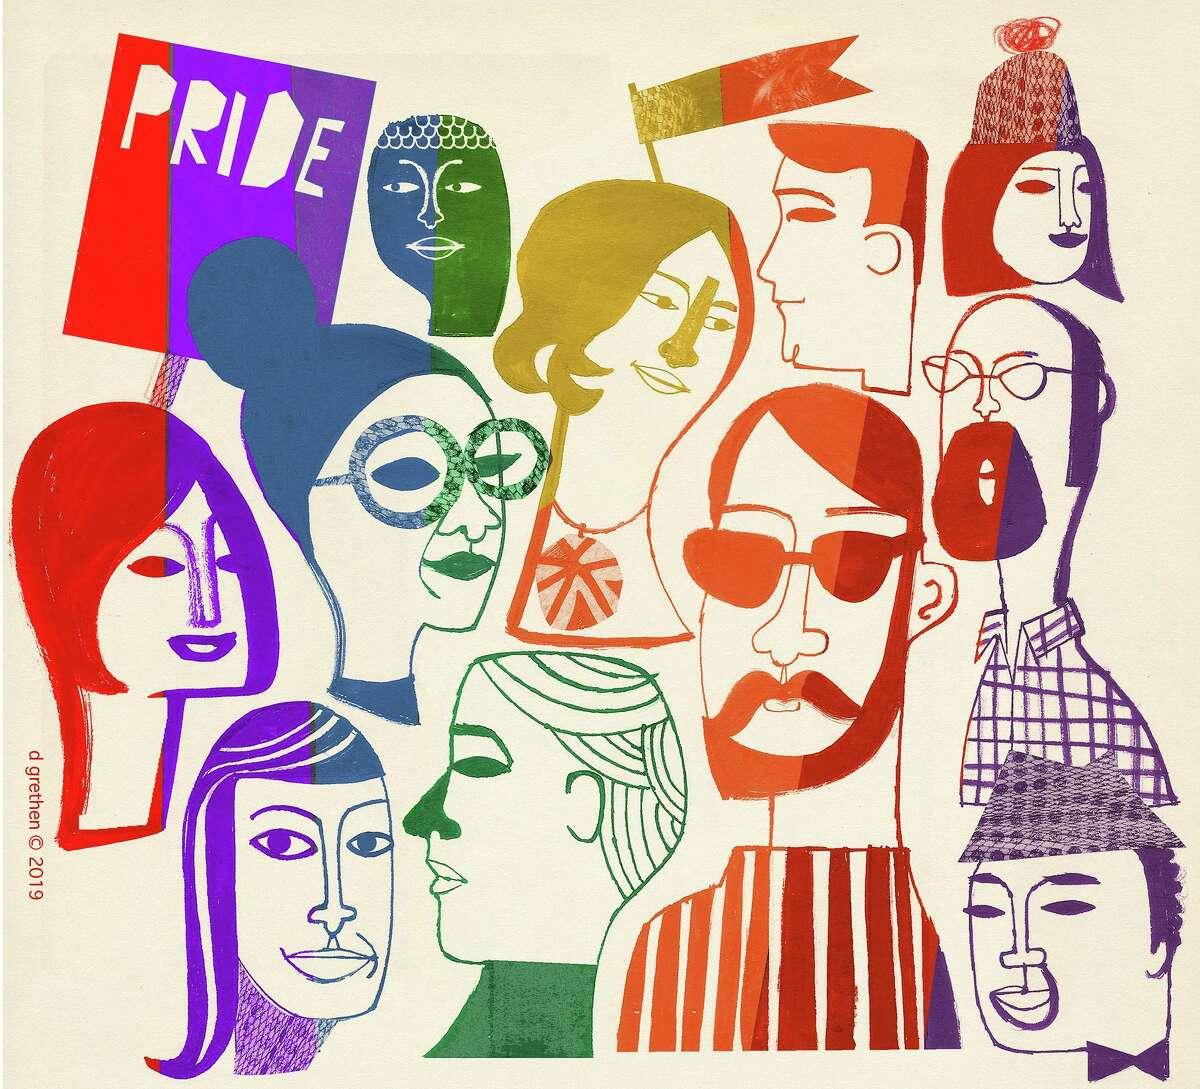 Donna Grethen graphic on LGBTQ community